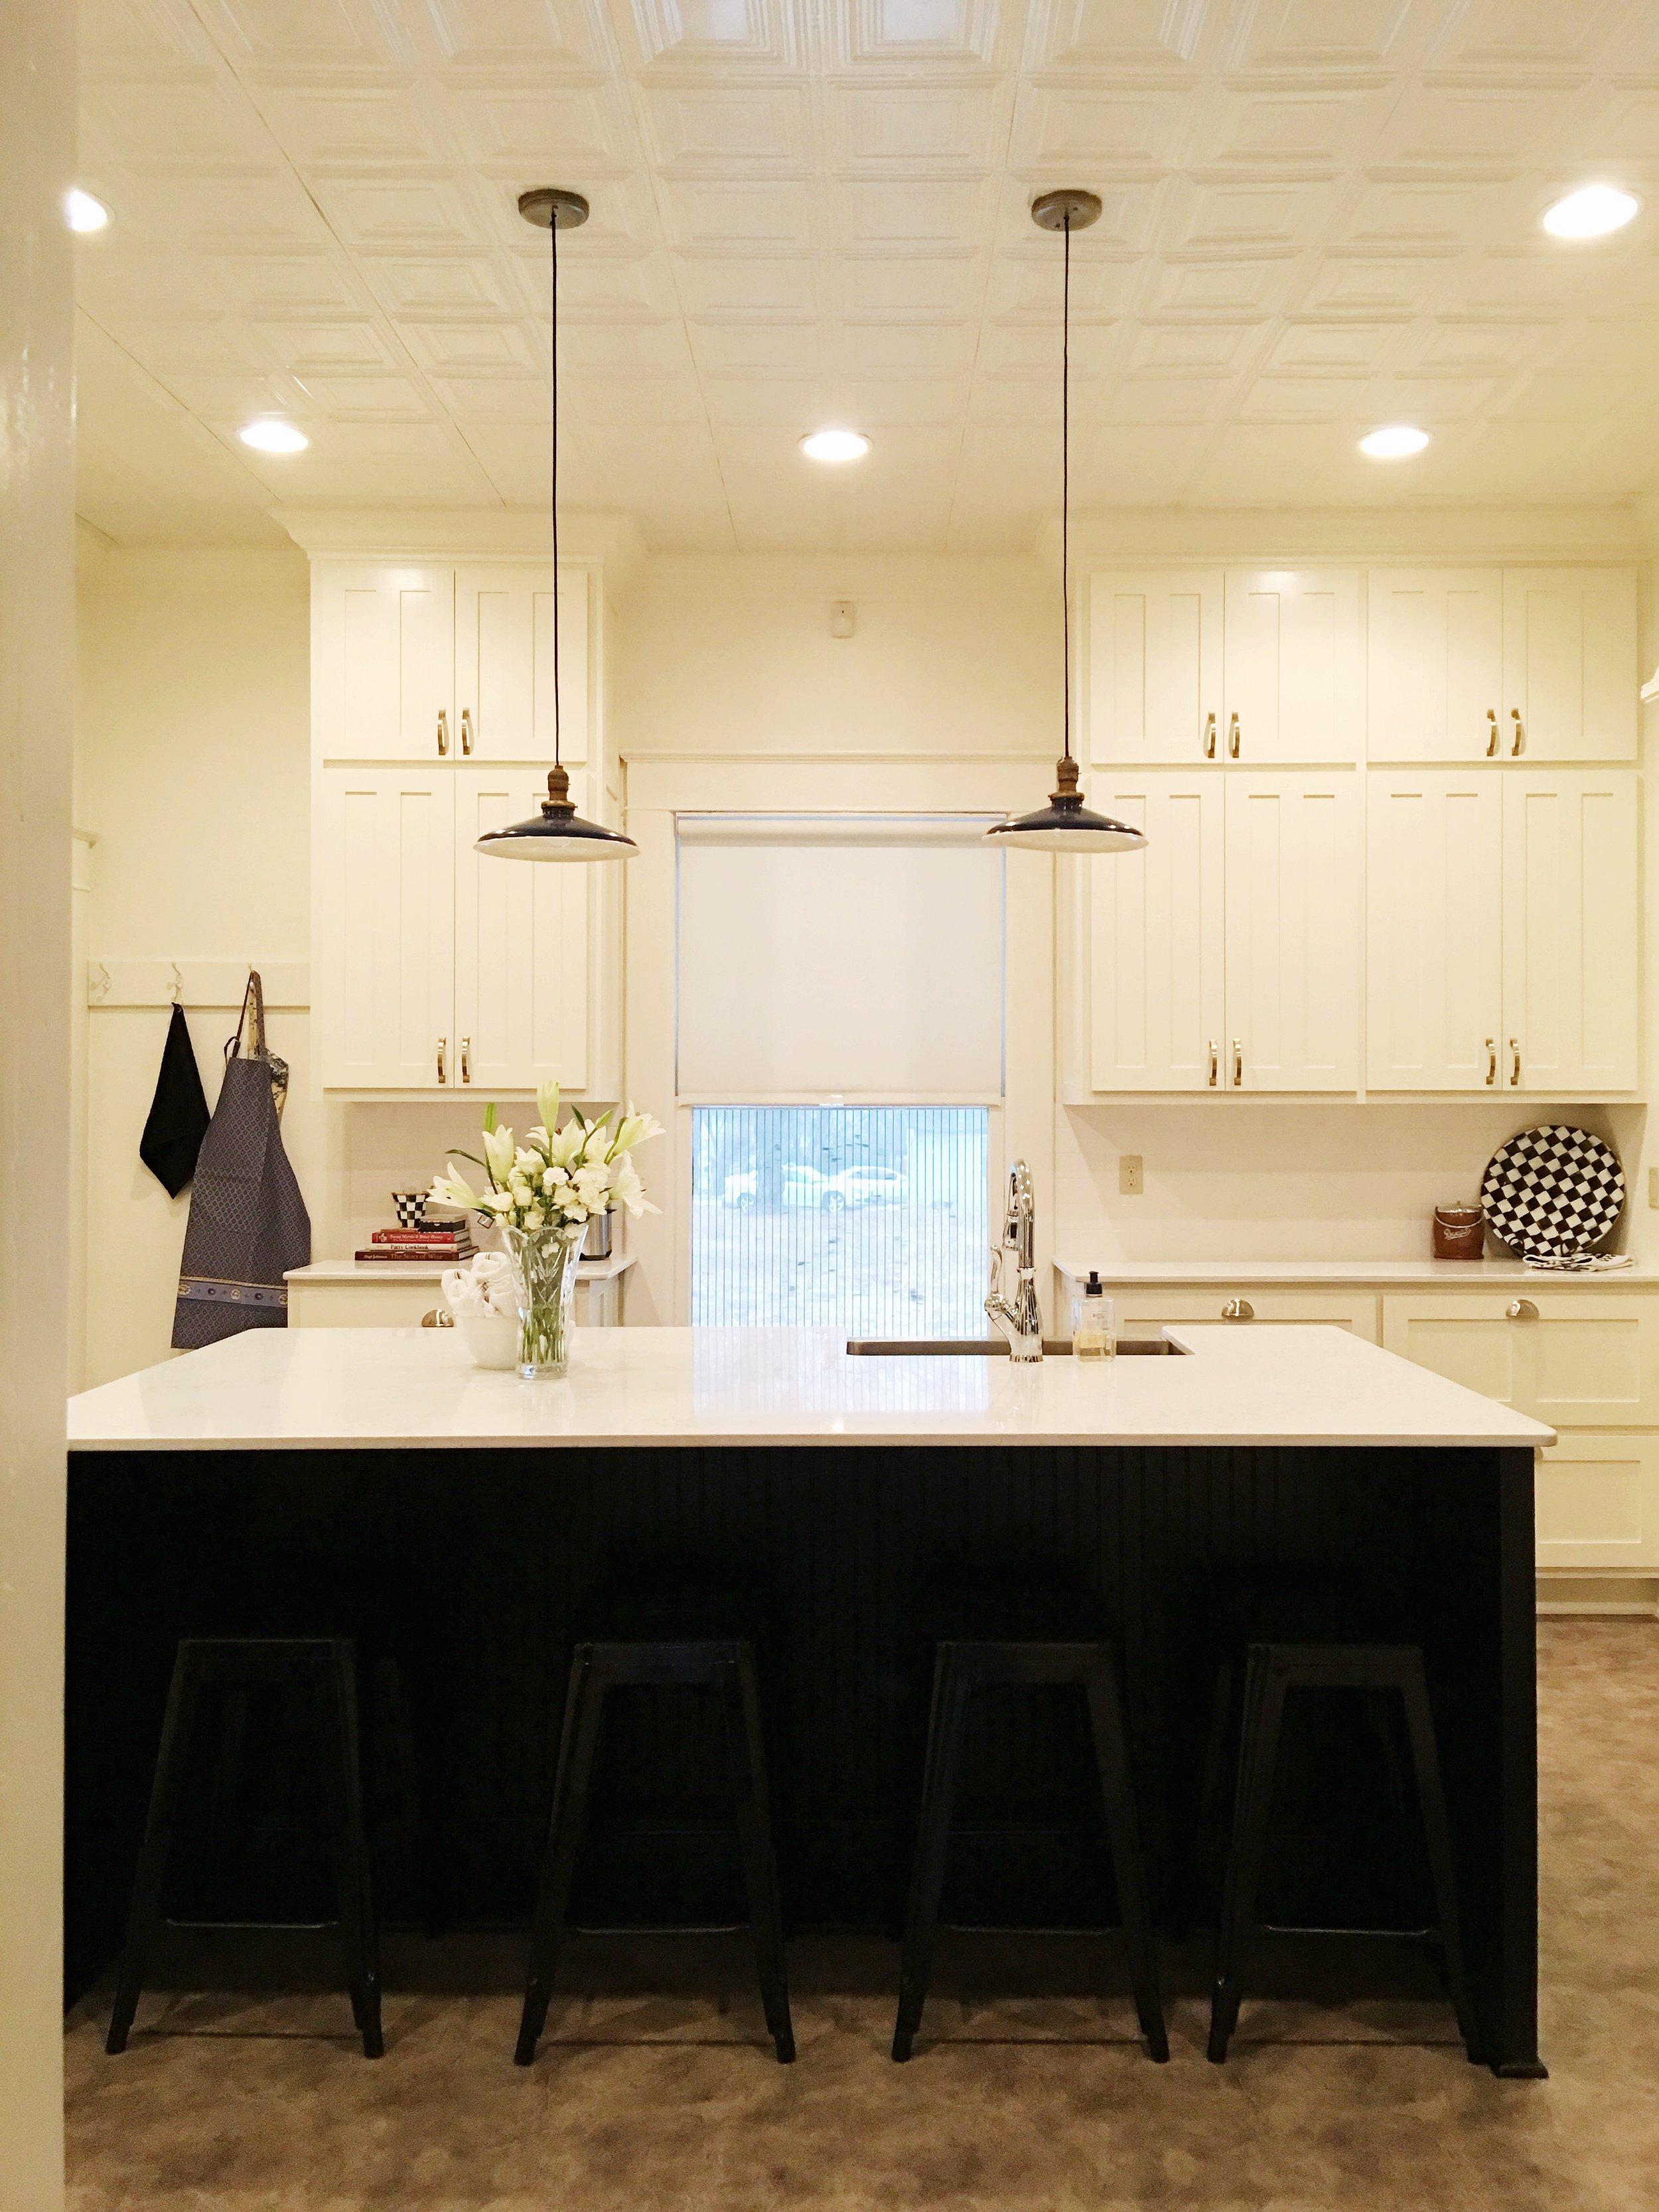 sharpe-house-kitchen-redone